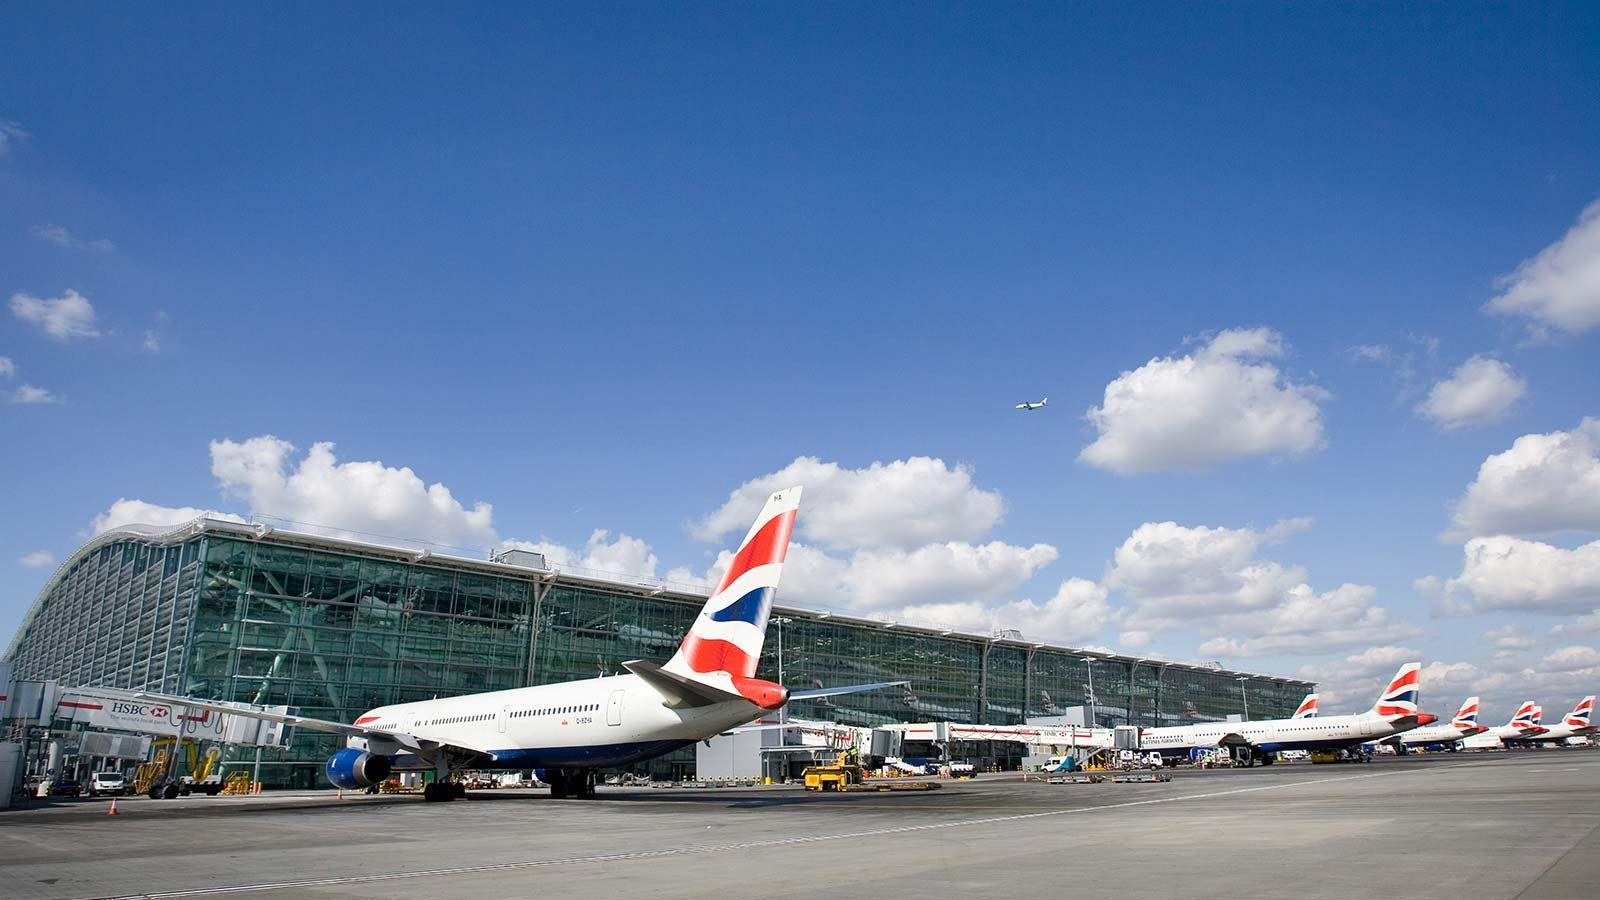 British Airways' Parked Planes, London Heathrow T5 - Mace Group